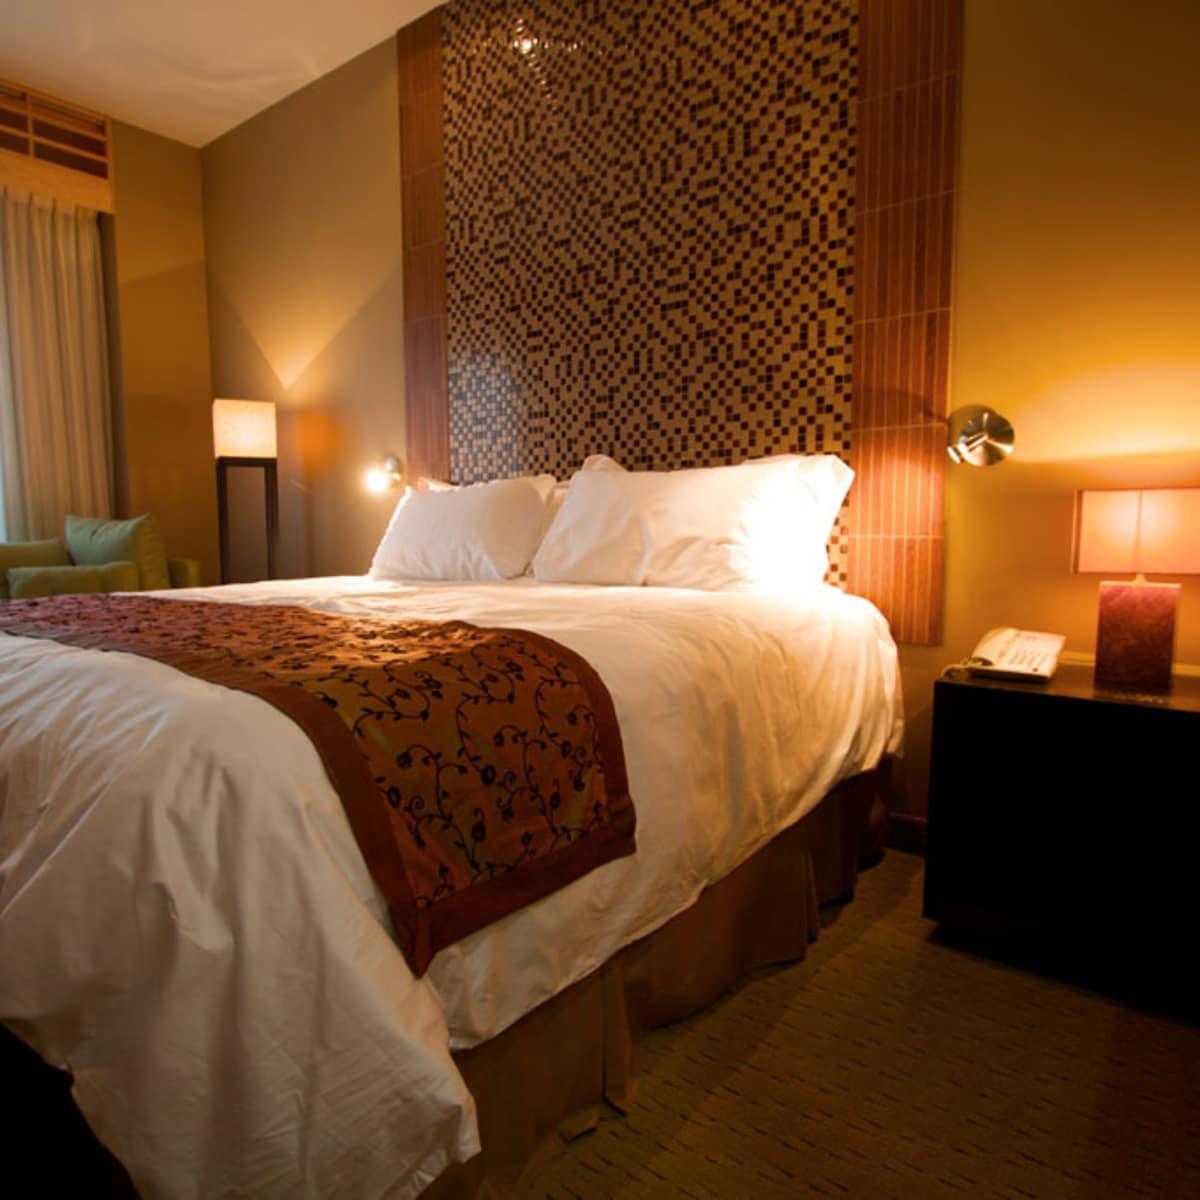 Austin_Photo: Places_Hotel_Casulo Hotel_room